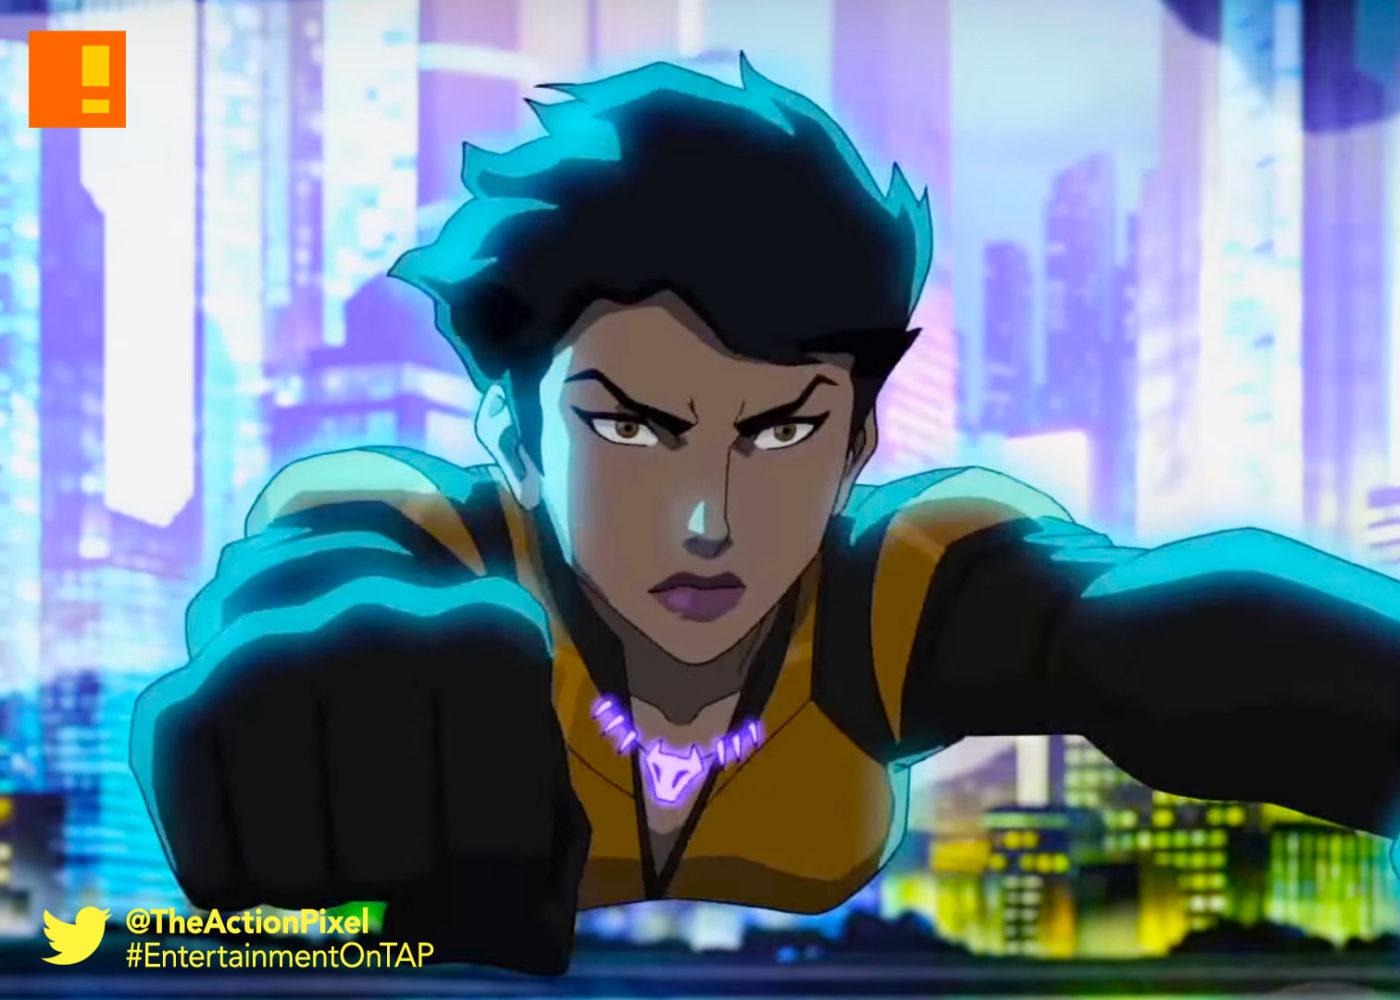 vixen, cw , cw seed, season 2, animation, dc comics, the flash, gustin, grant gustin, firestorm, season 2